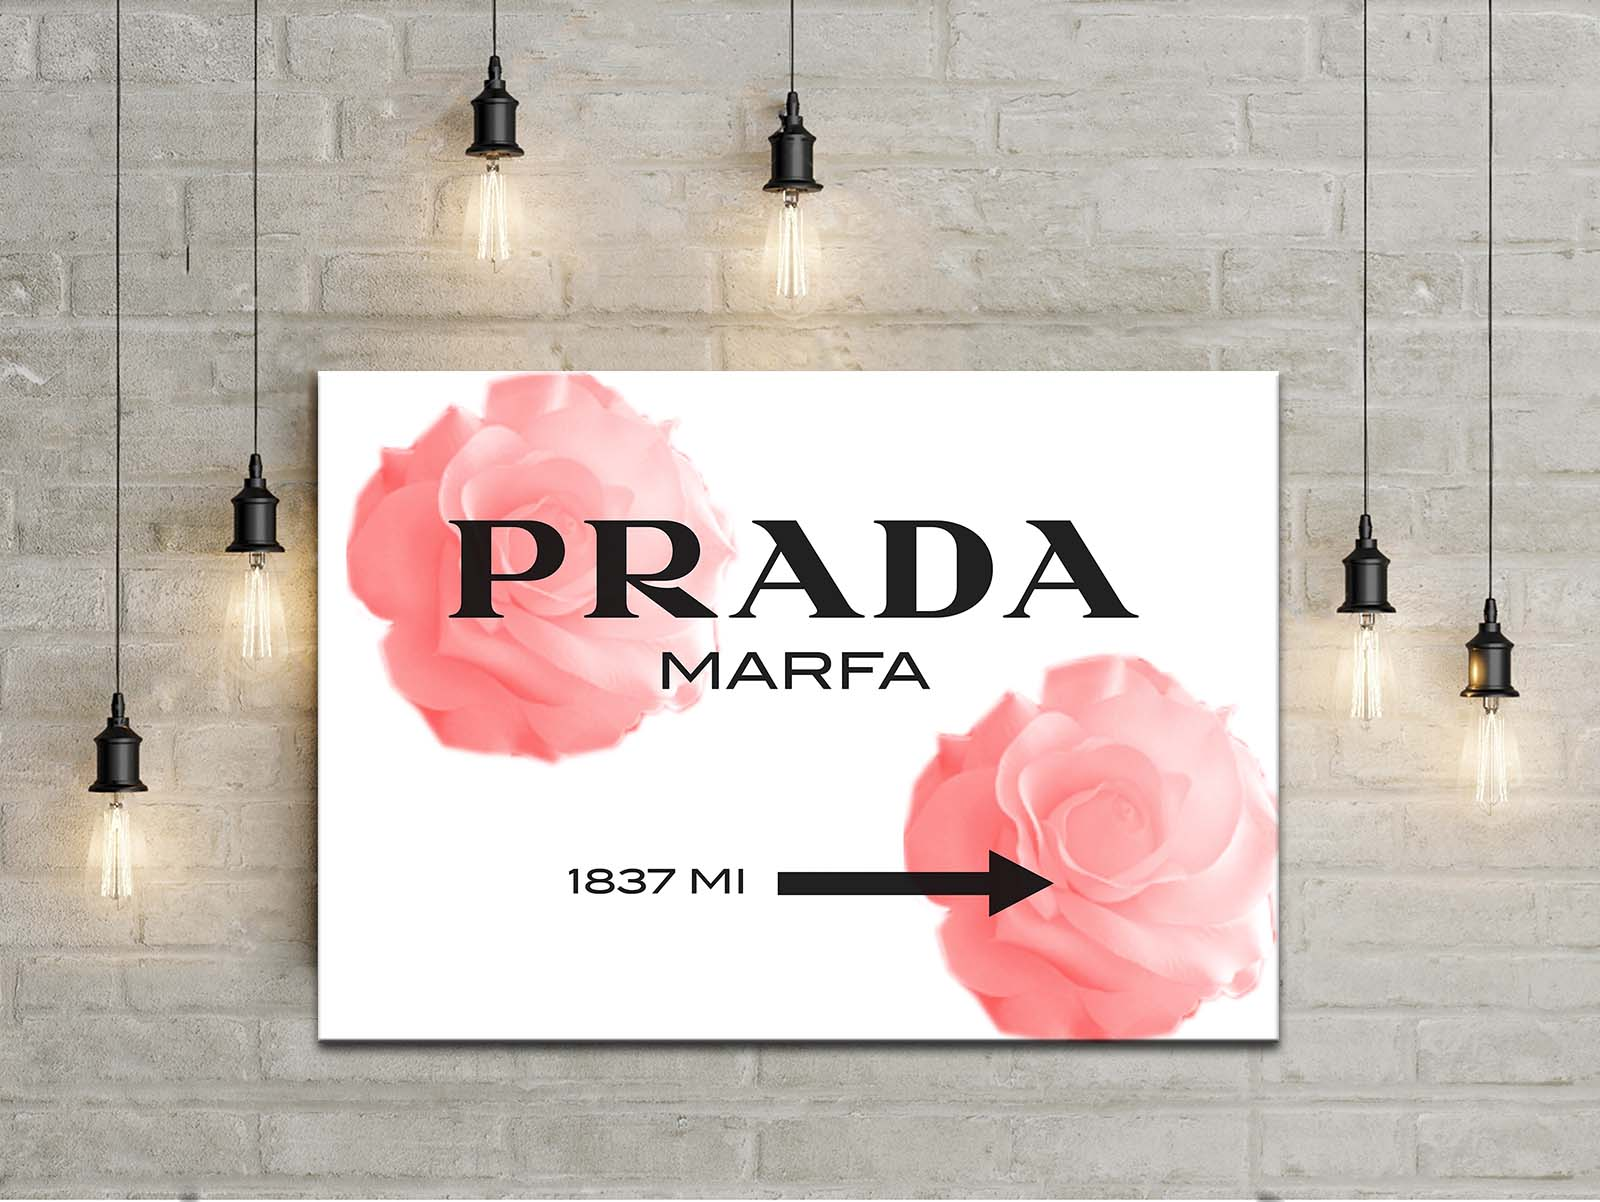 Prada Marfa roses impression sur toile